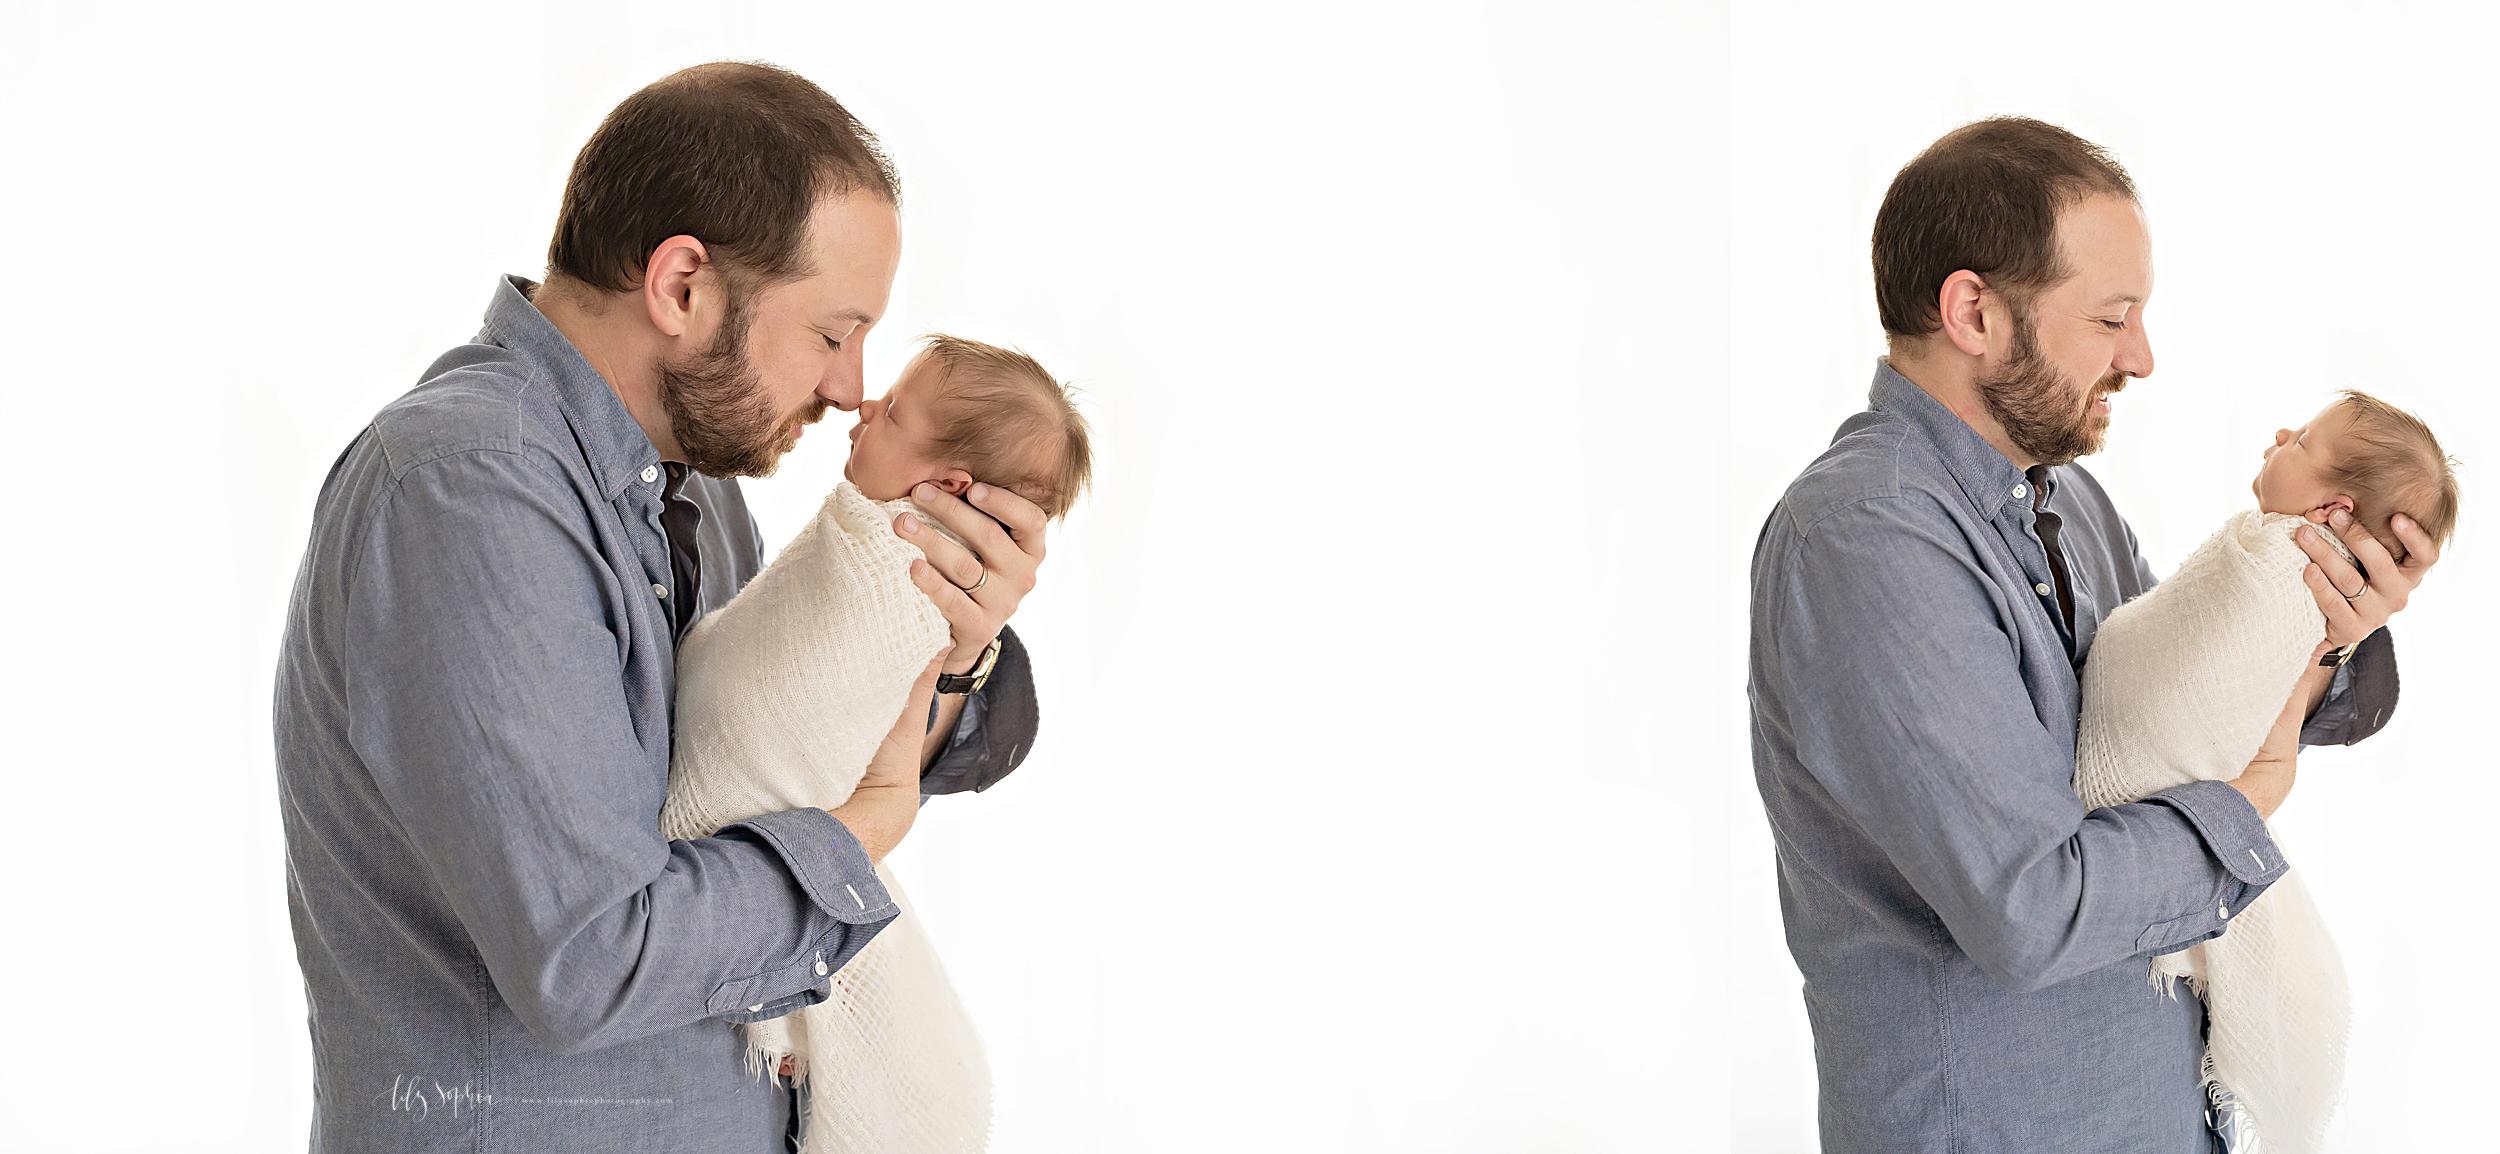 atlanta-midtown-brookhaven-ashford-dunwoody-virginia-highlands-roswell-decatur-lily-sophia-photography-newborn-baby-boy-big-brother-family-studio-session_0622.jpg